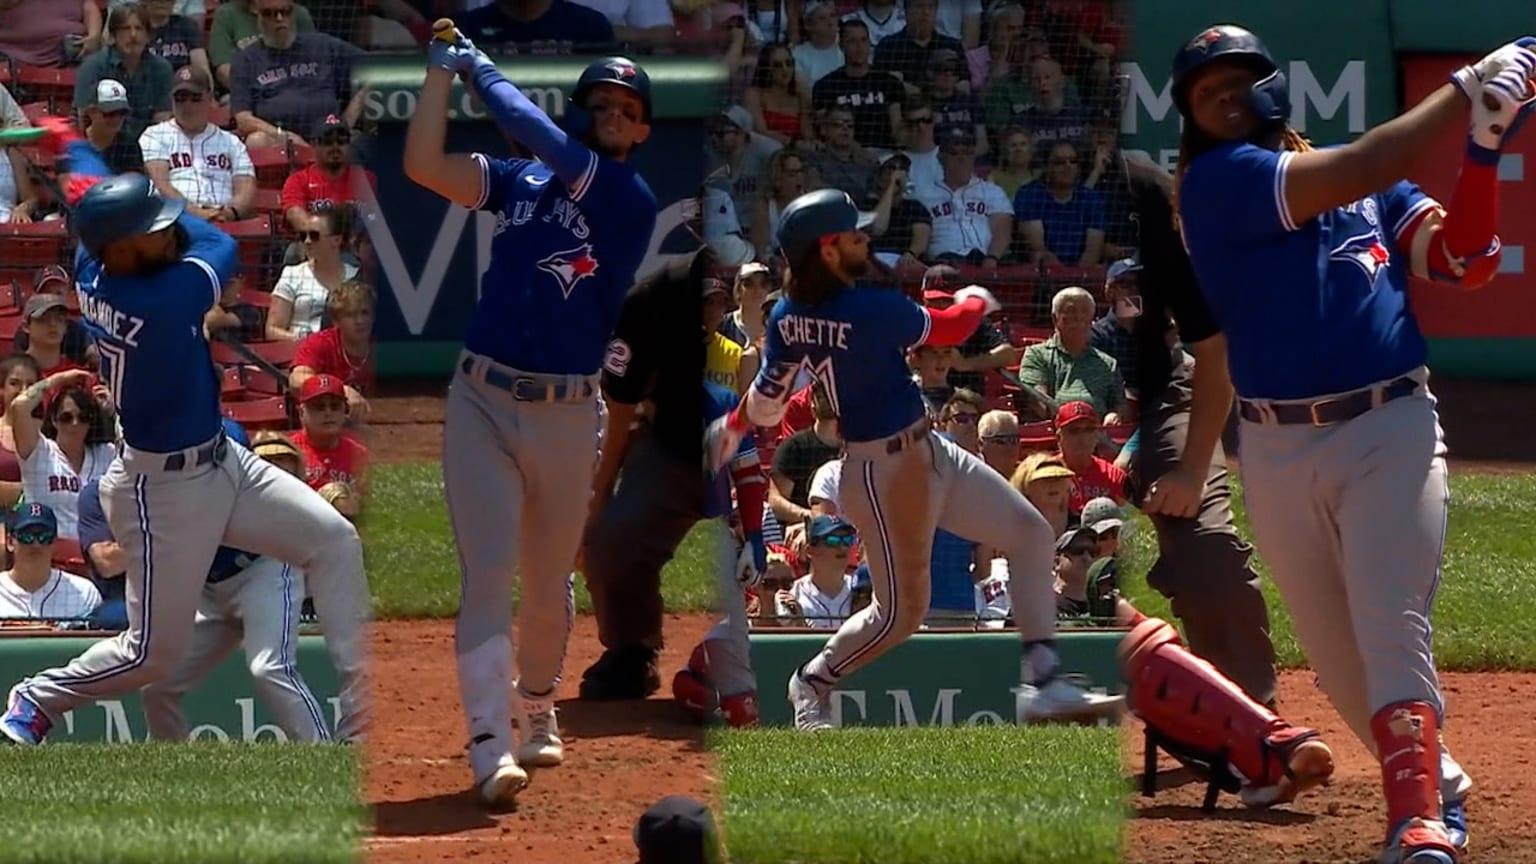 Blue Jays hit 8 home runs in win | 06/13/2021